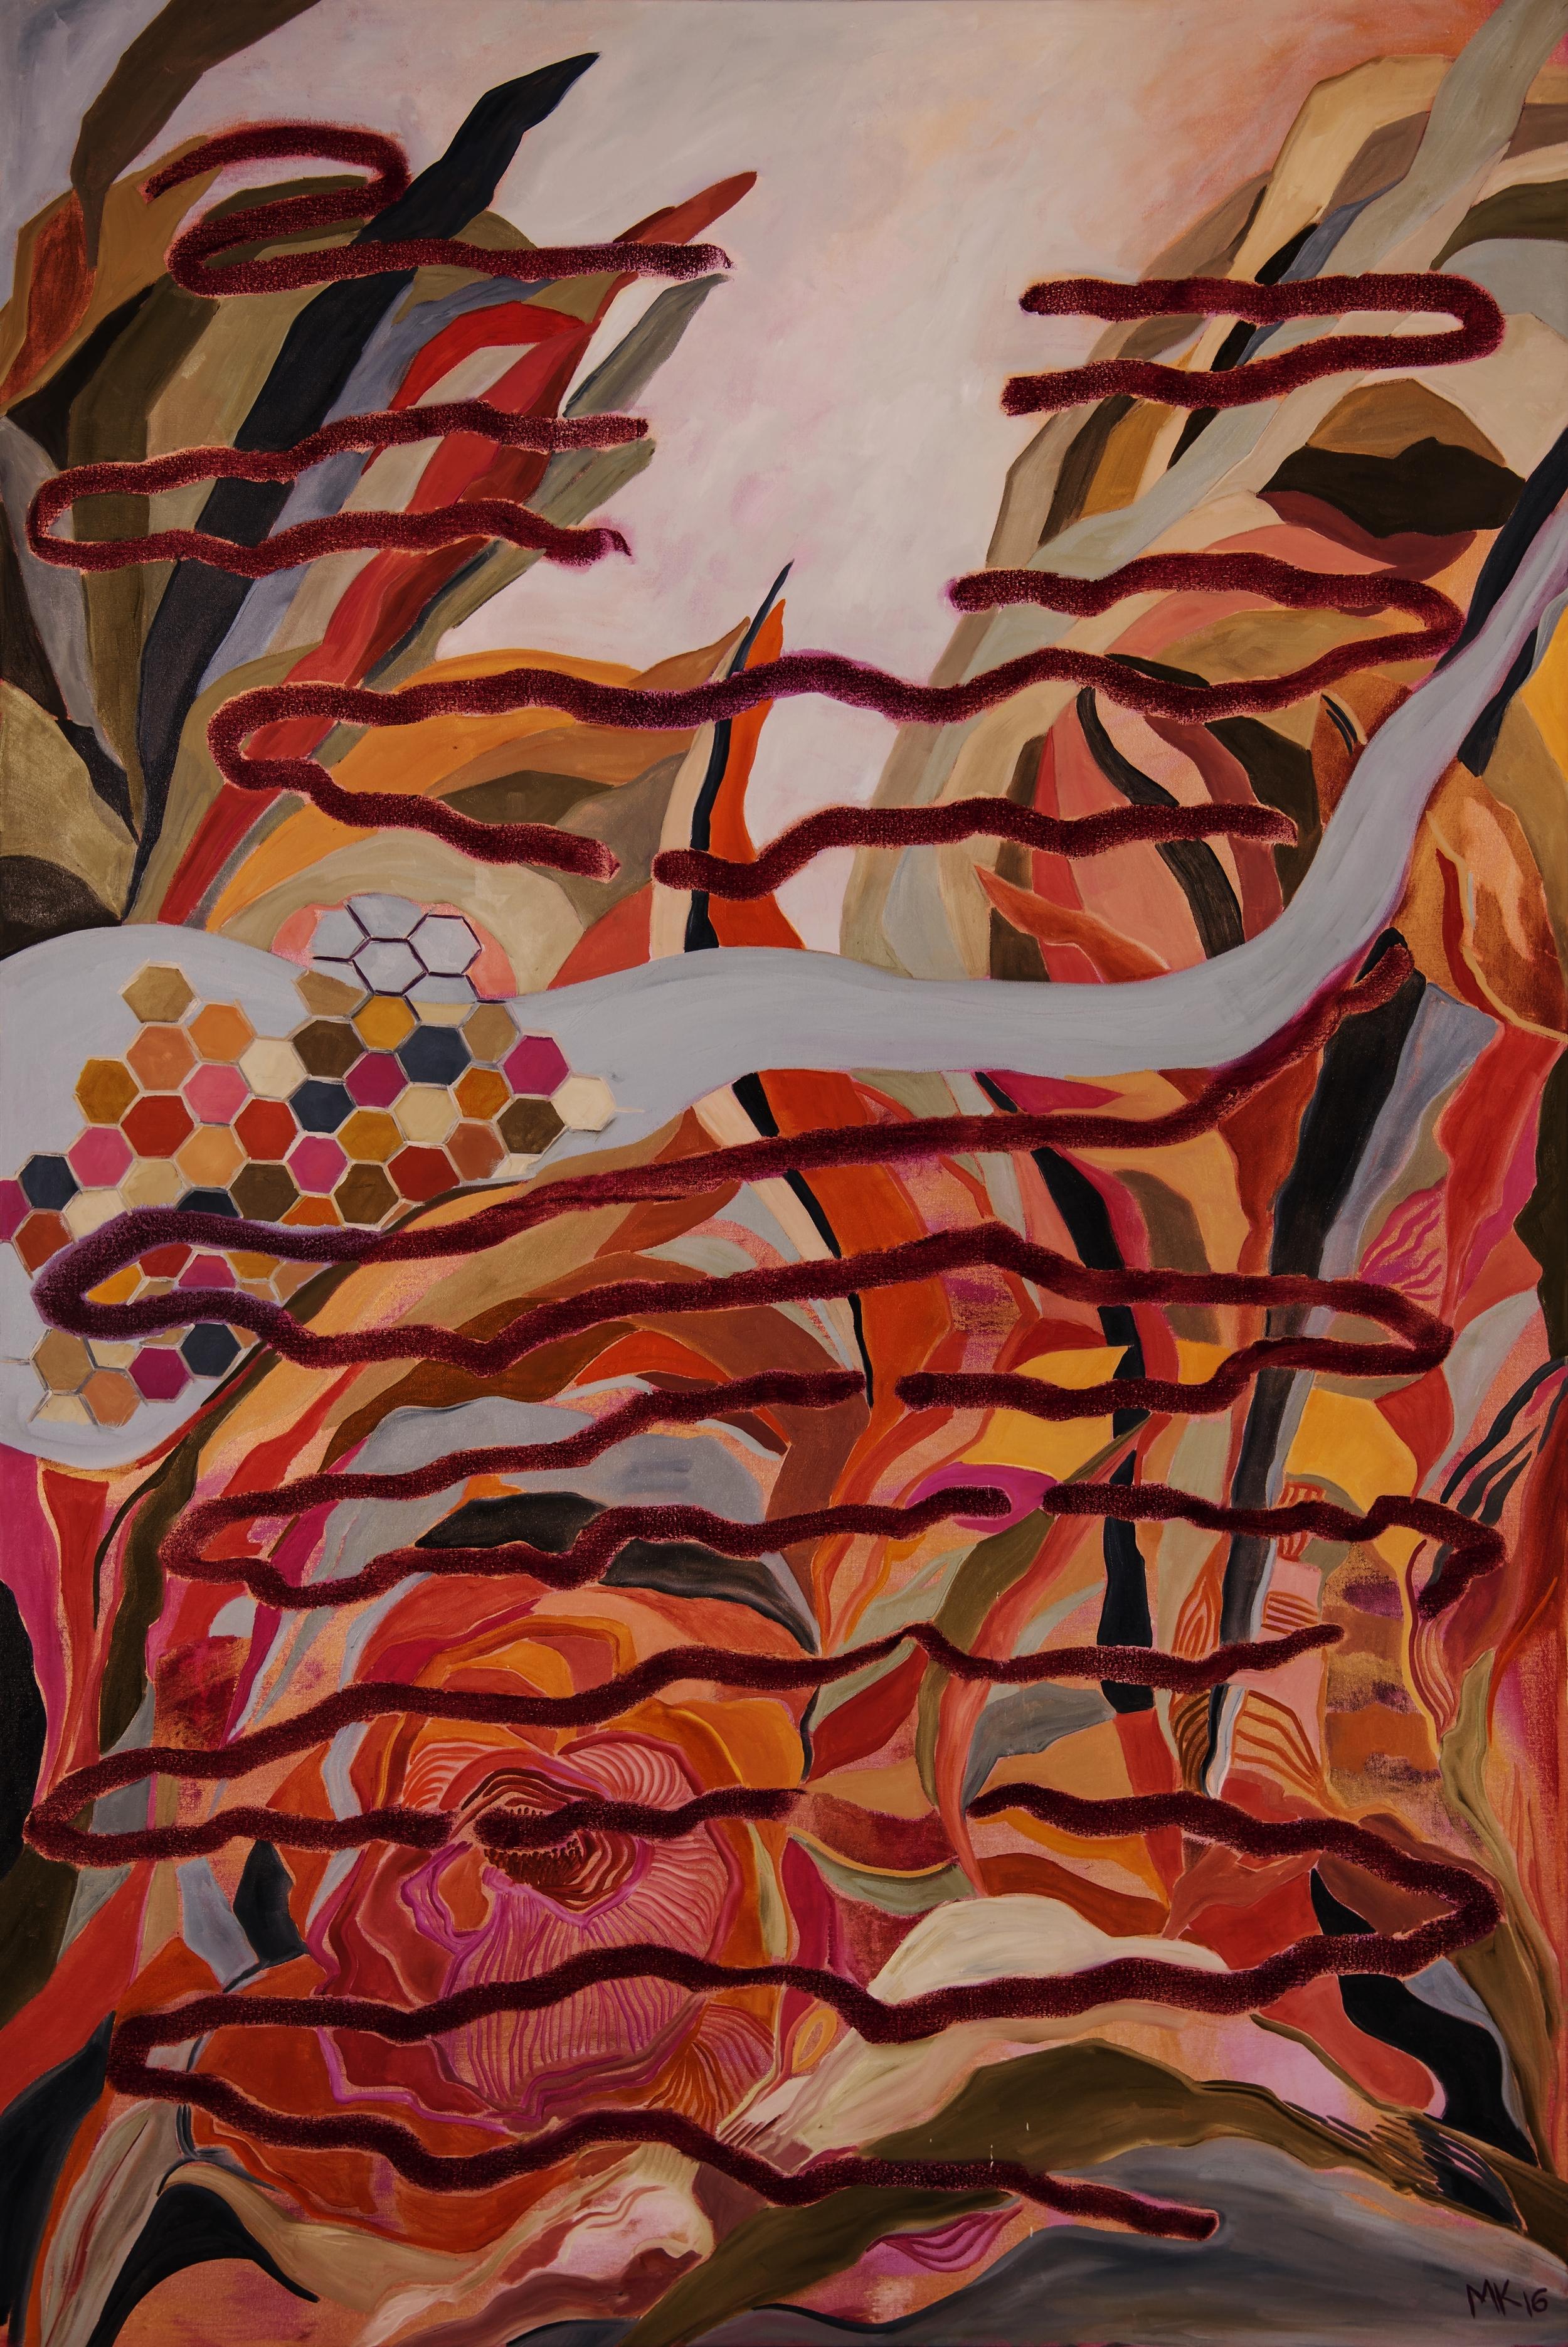 "MK 2016, Roots of Feeling XIX, Oil on Canvas, 72"" x 48"""